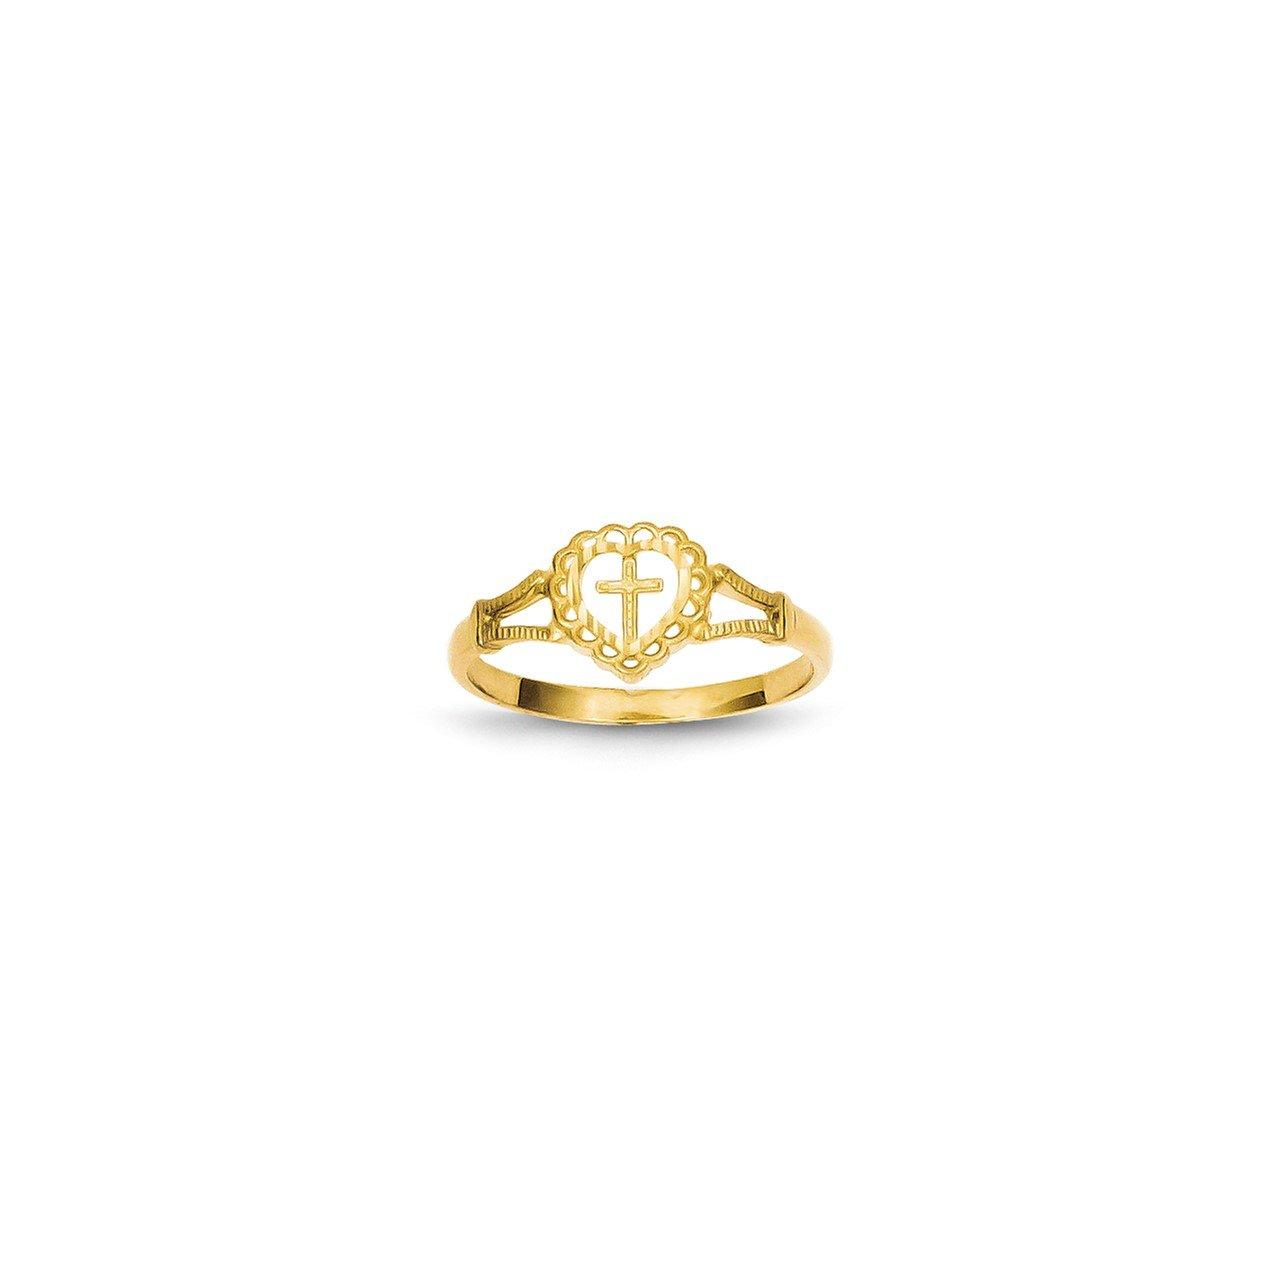 14K Diamond-Cut Childs Heart and Cross Ring